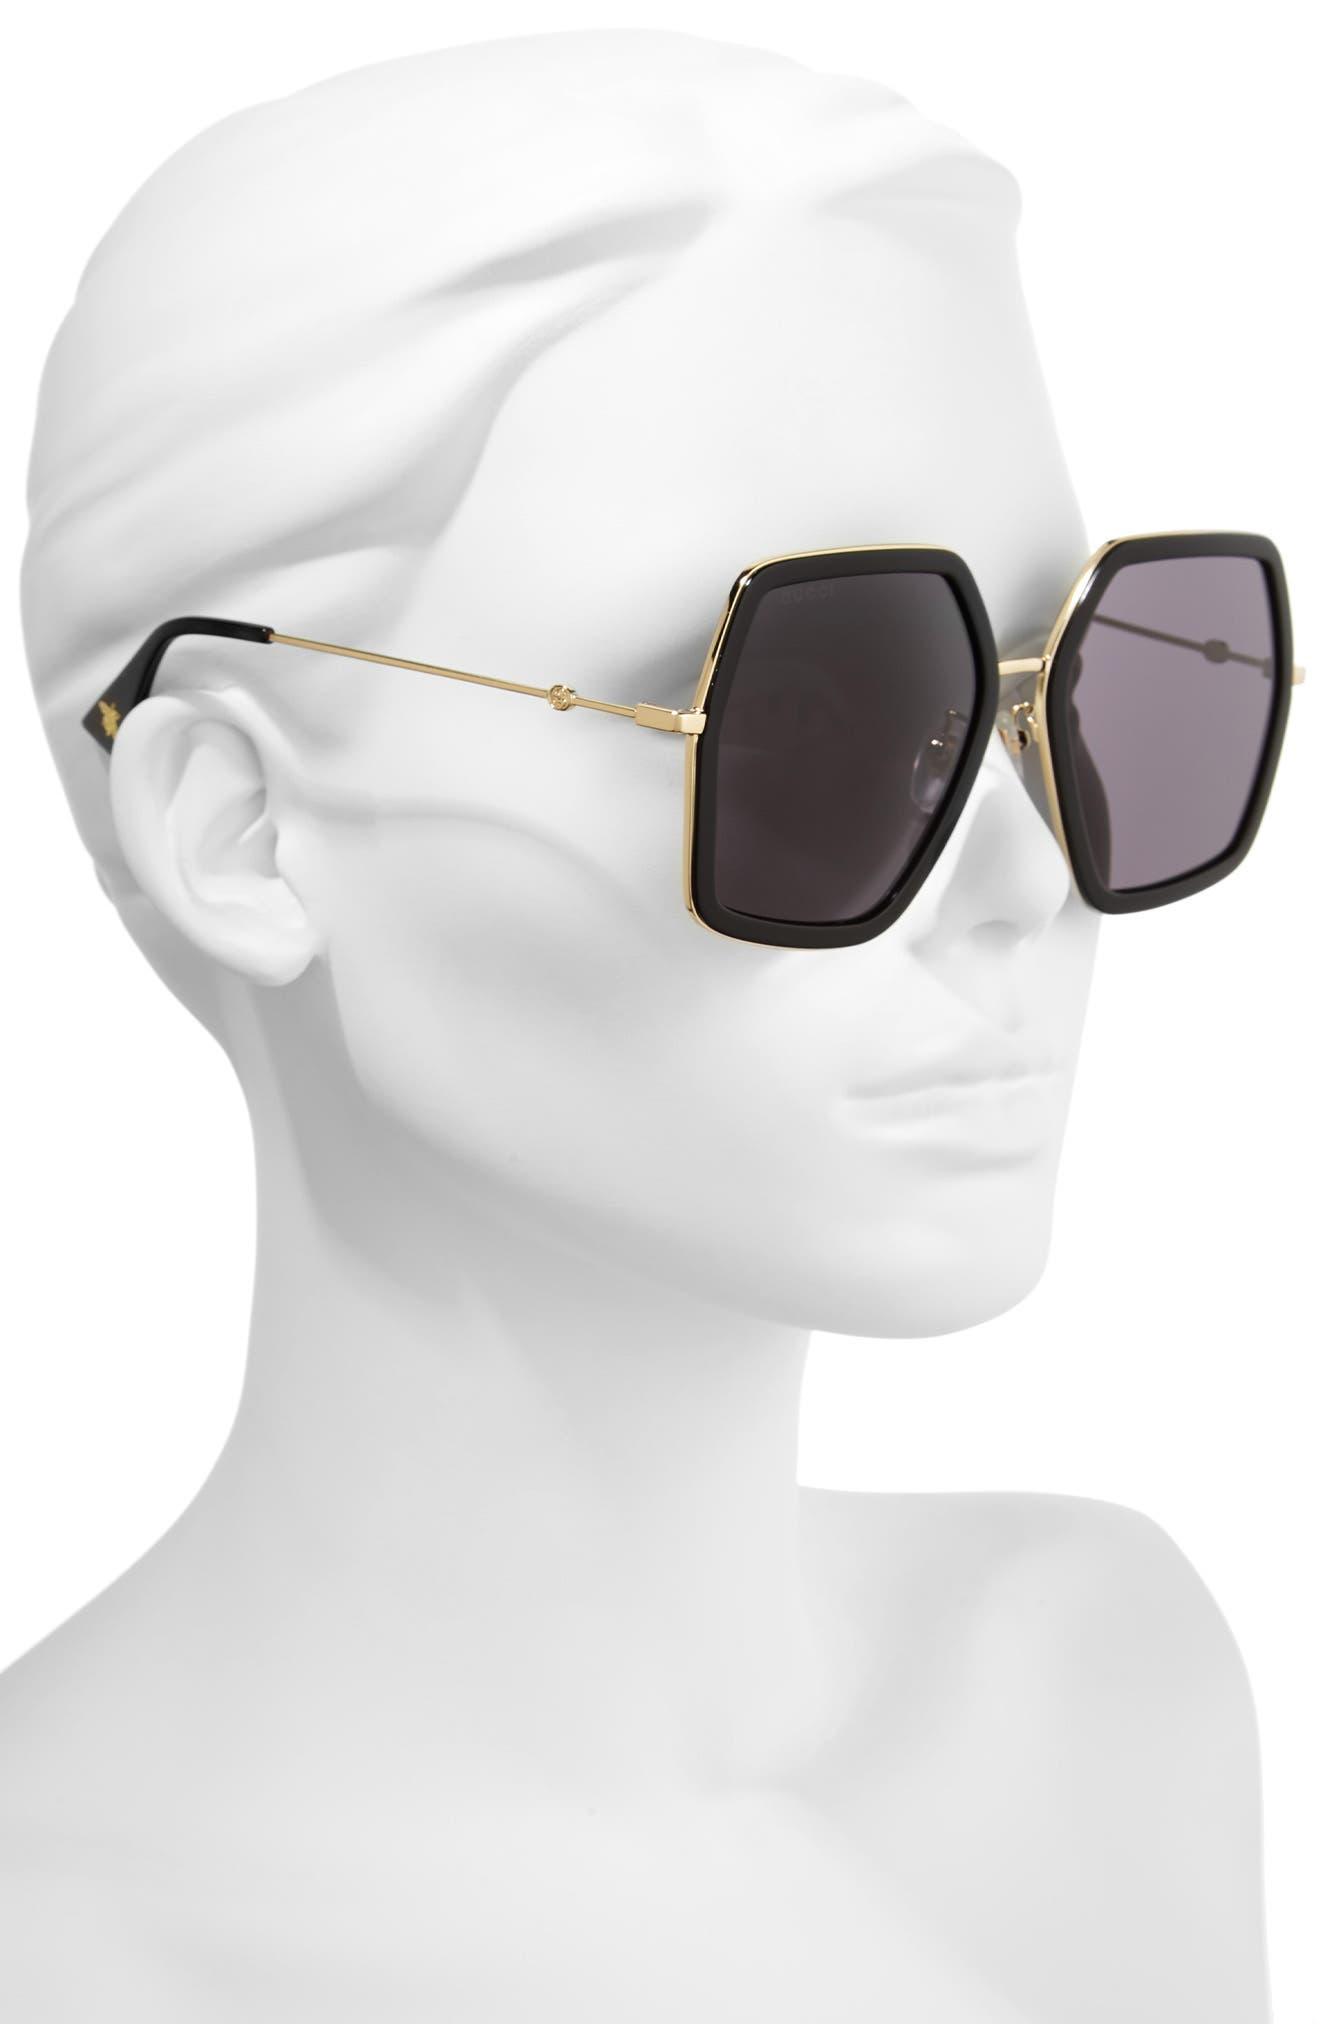 56mm Sunglasses,                             Alternate thumbnail 2, color,                             Black/ Grey